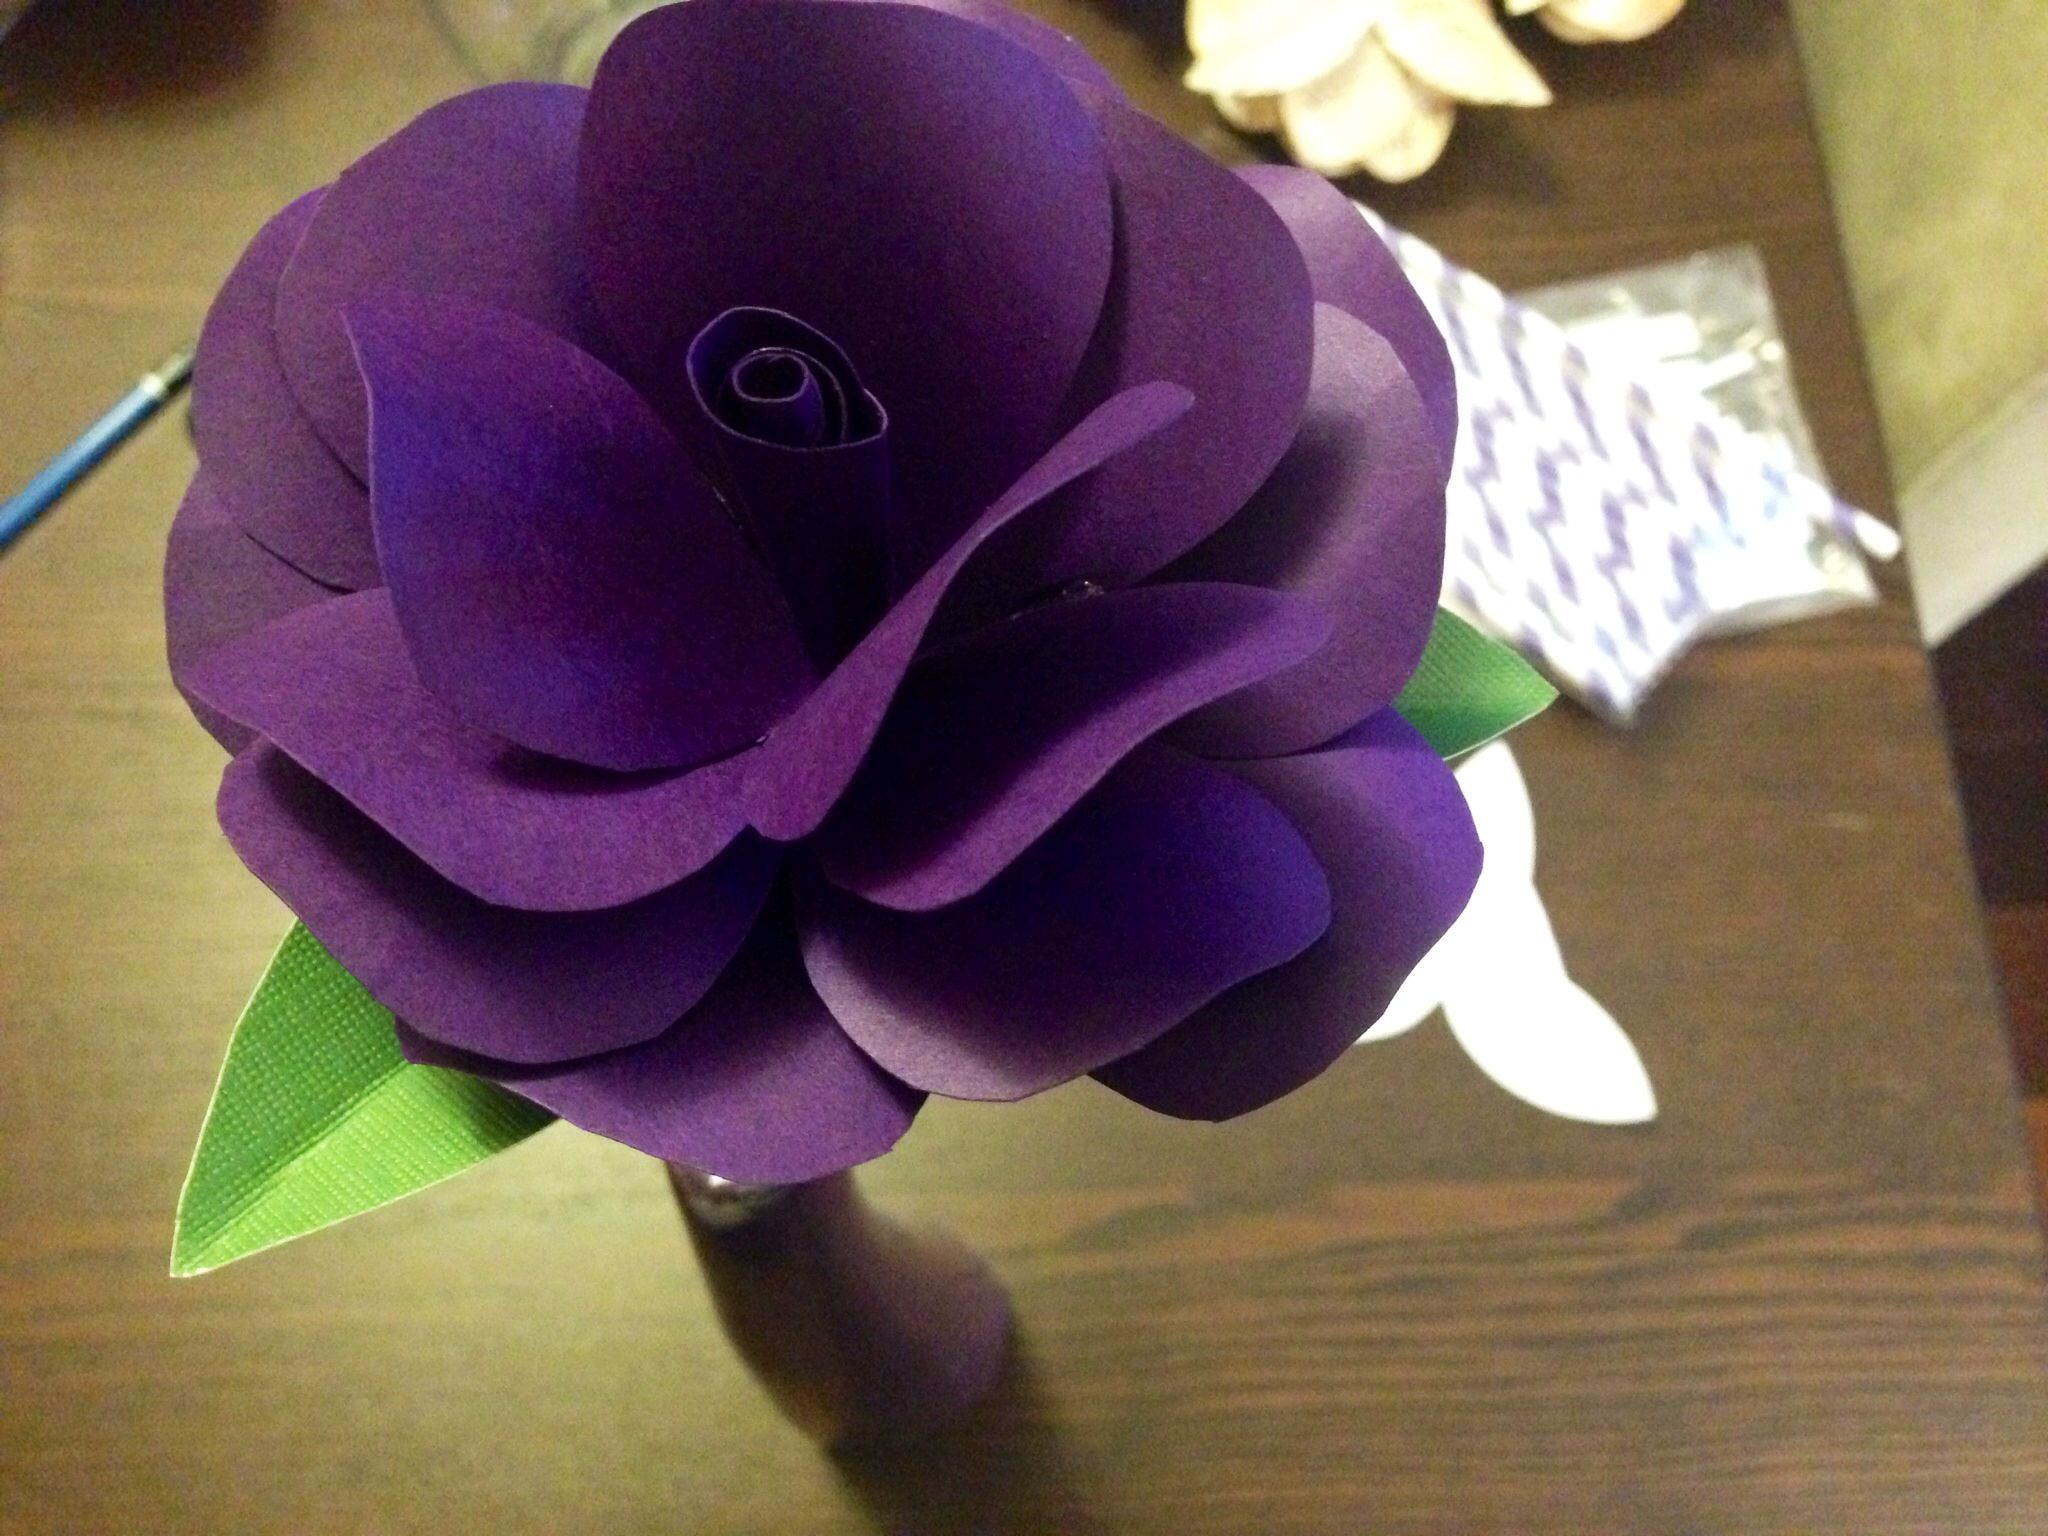 Diy paper flower wedding decorations  Purple paper flower diy wedding decor  Crafty Ideas  Pinterest